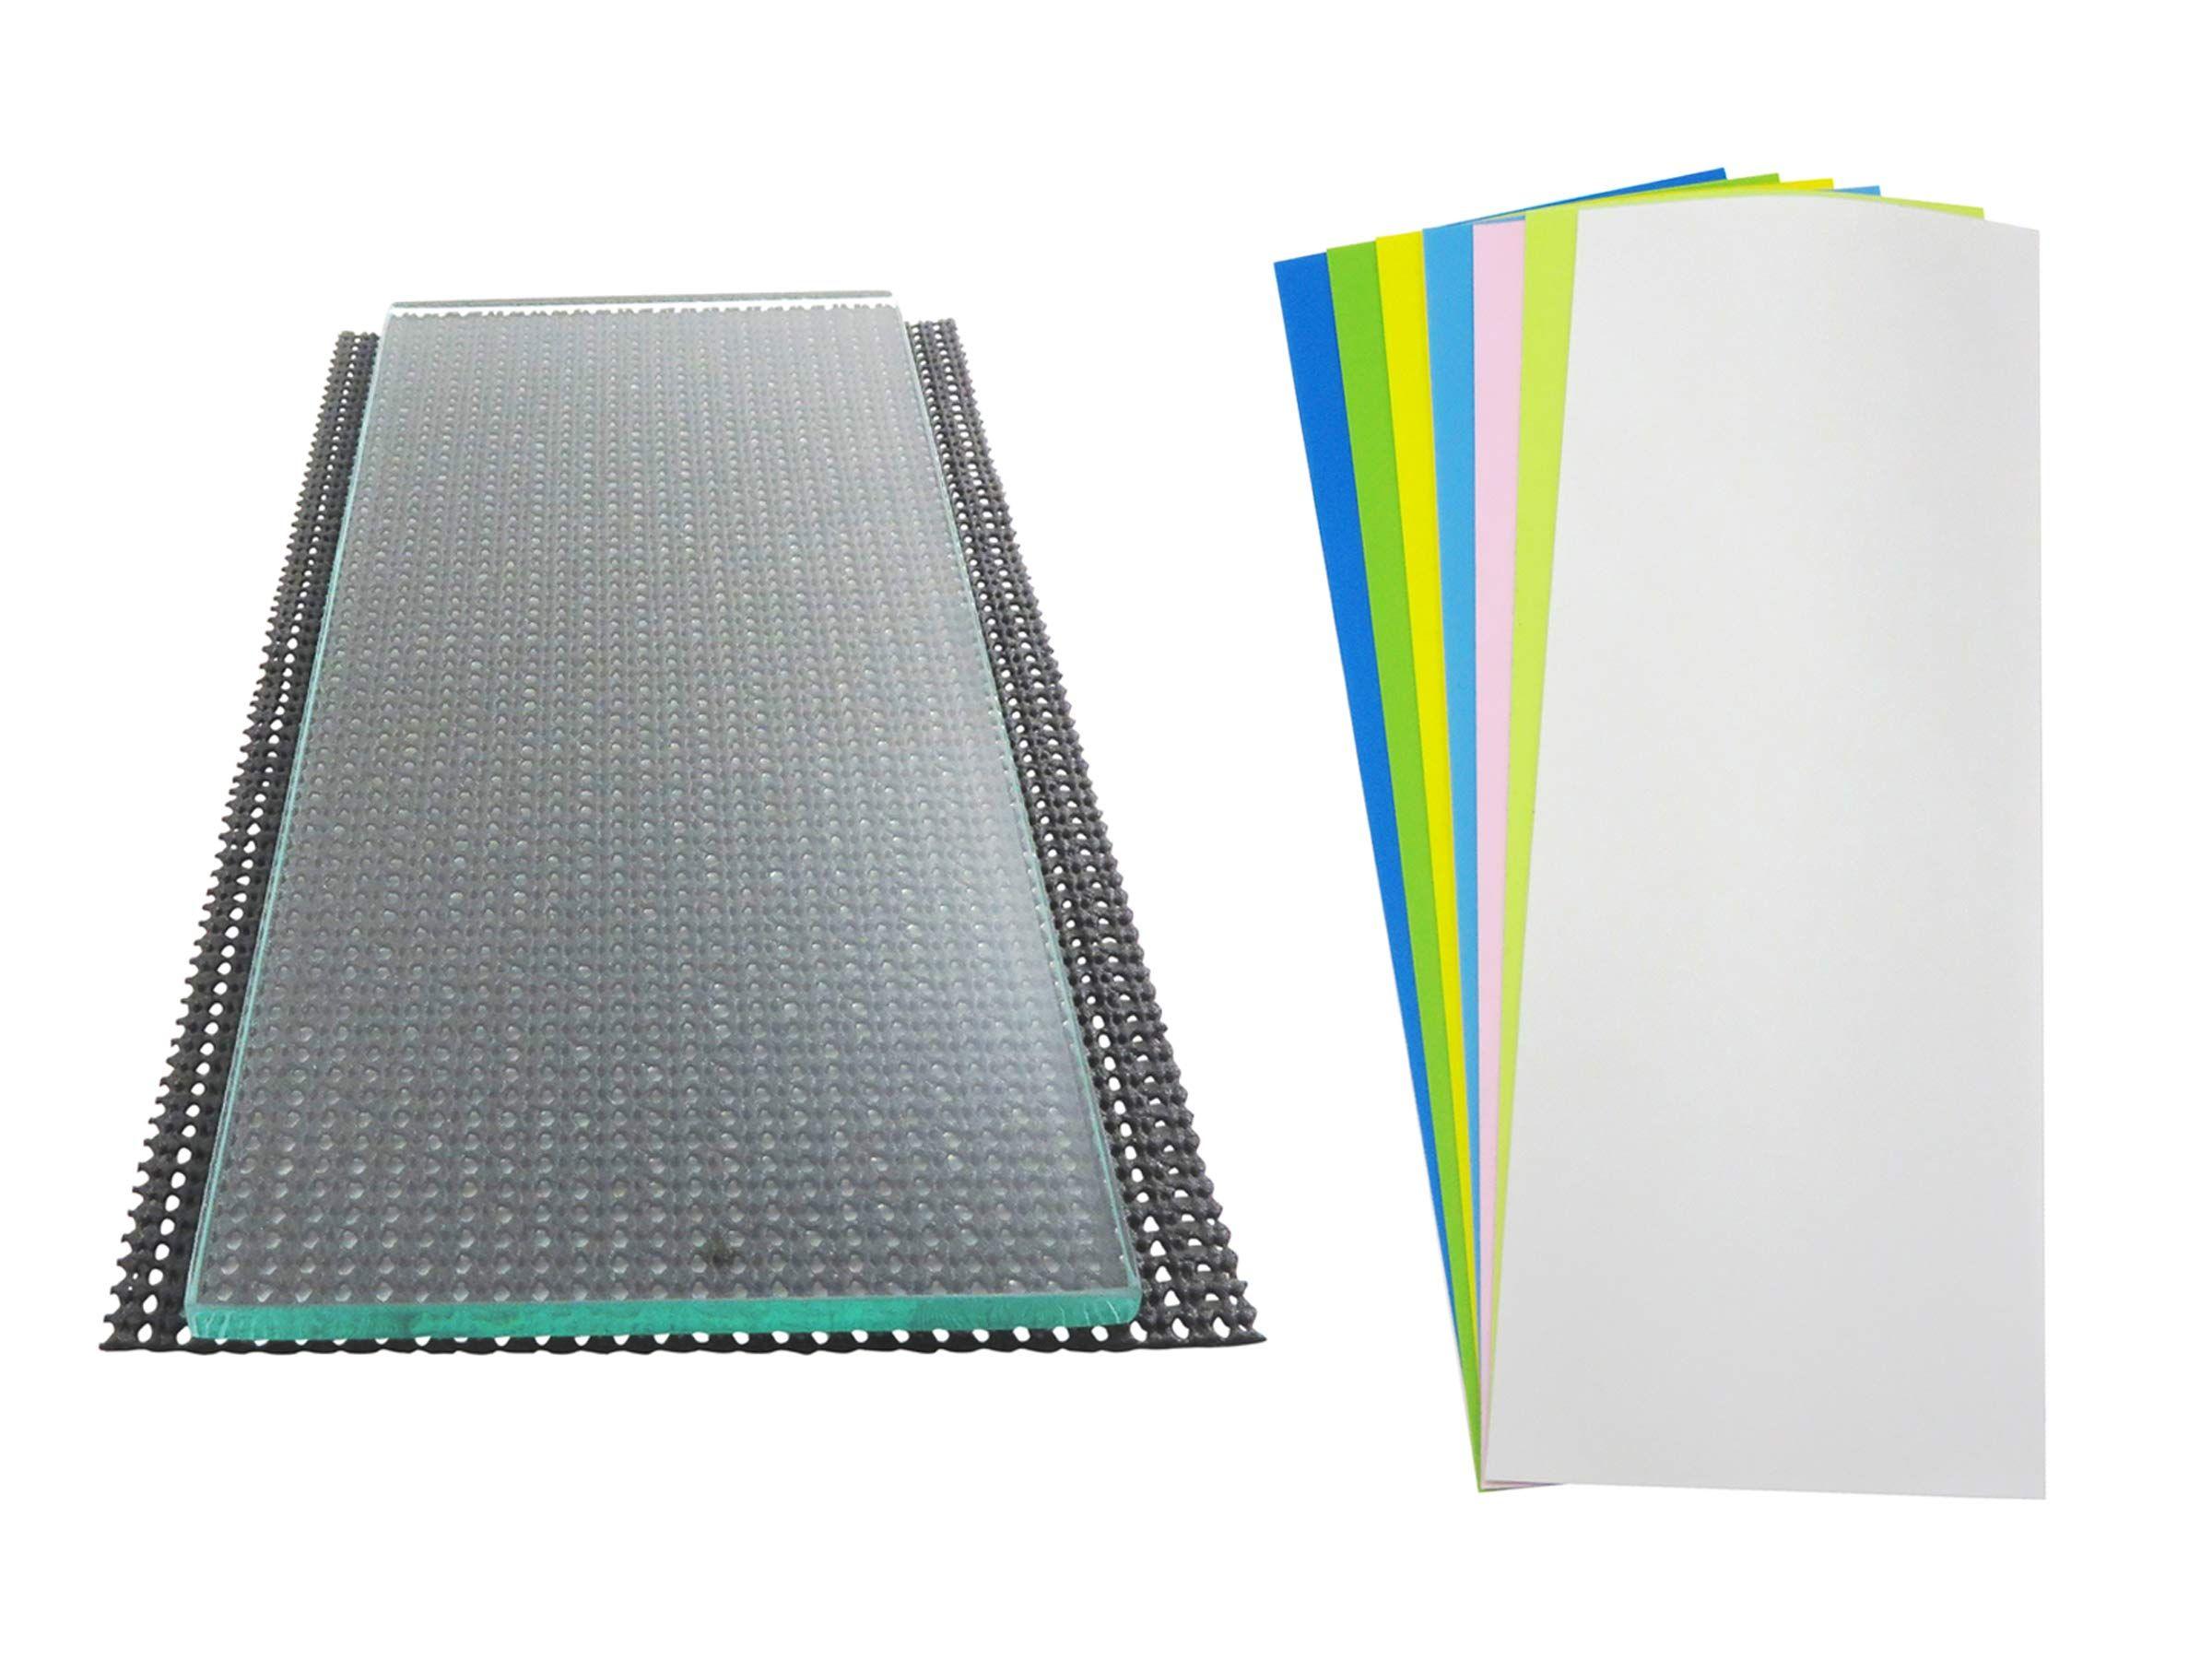 Taytools 279182 Single Sheet 5 16 X 6 X 12 Dead Flat Float Plate Glass With 7 Sheets 3m Tm La Best Sharpening Stone Pressure Sensitive Adhesive Single Sheets